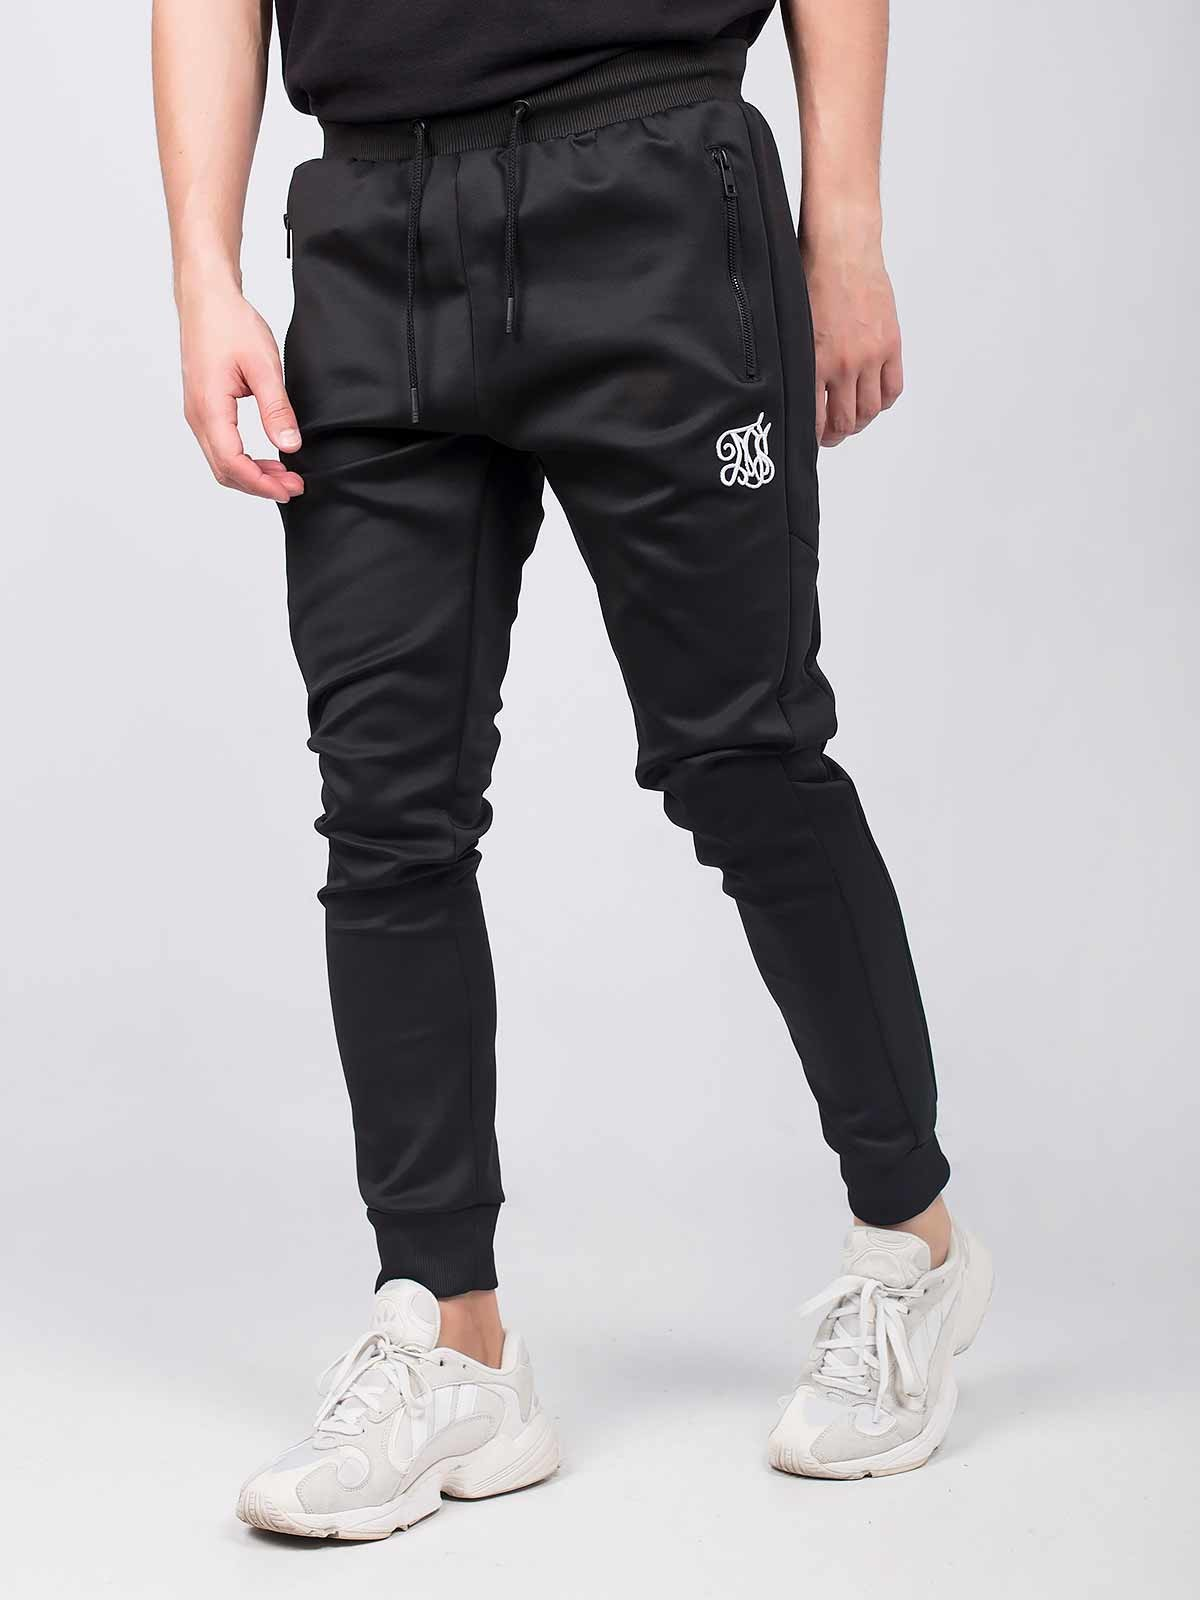 Pantalones deportivos ajustados